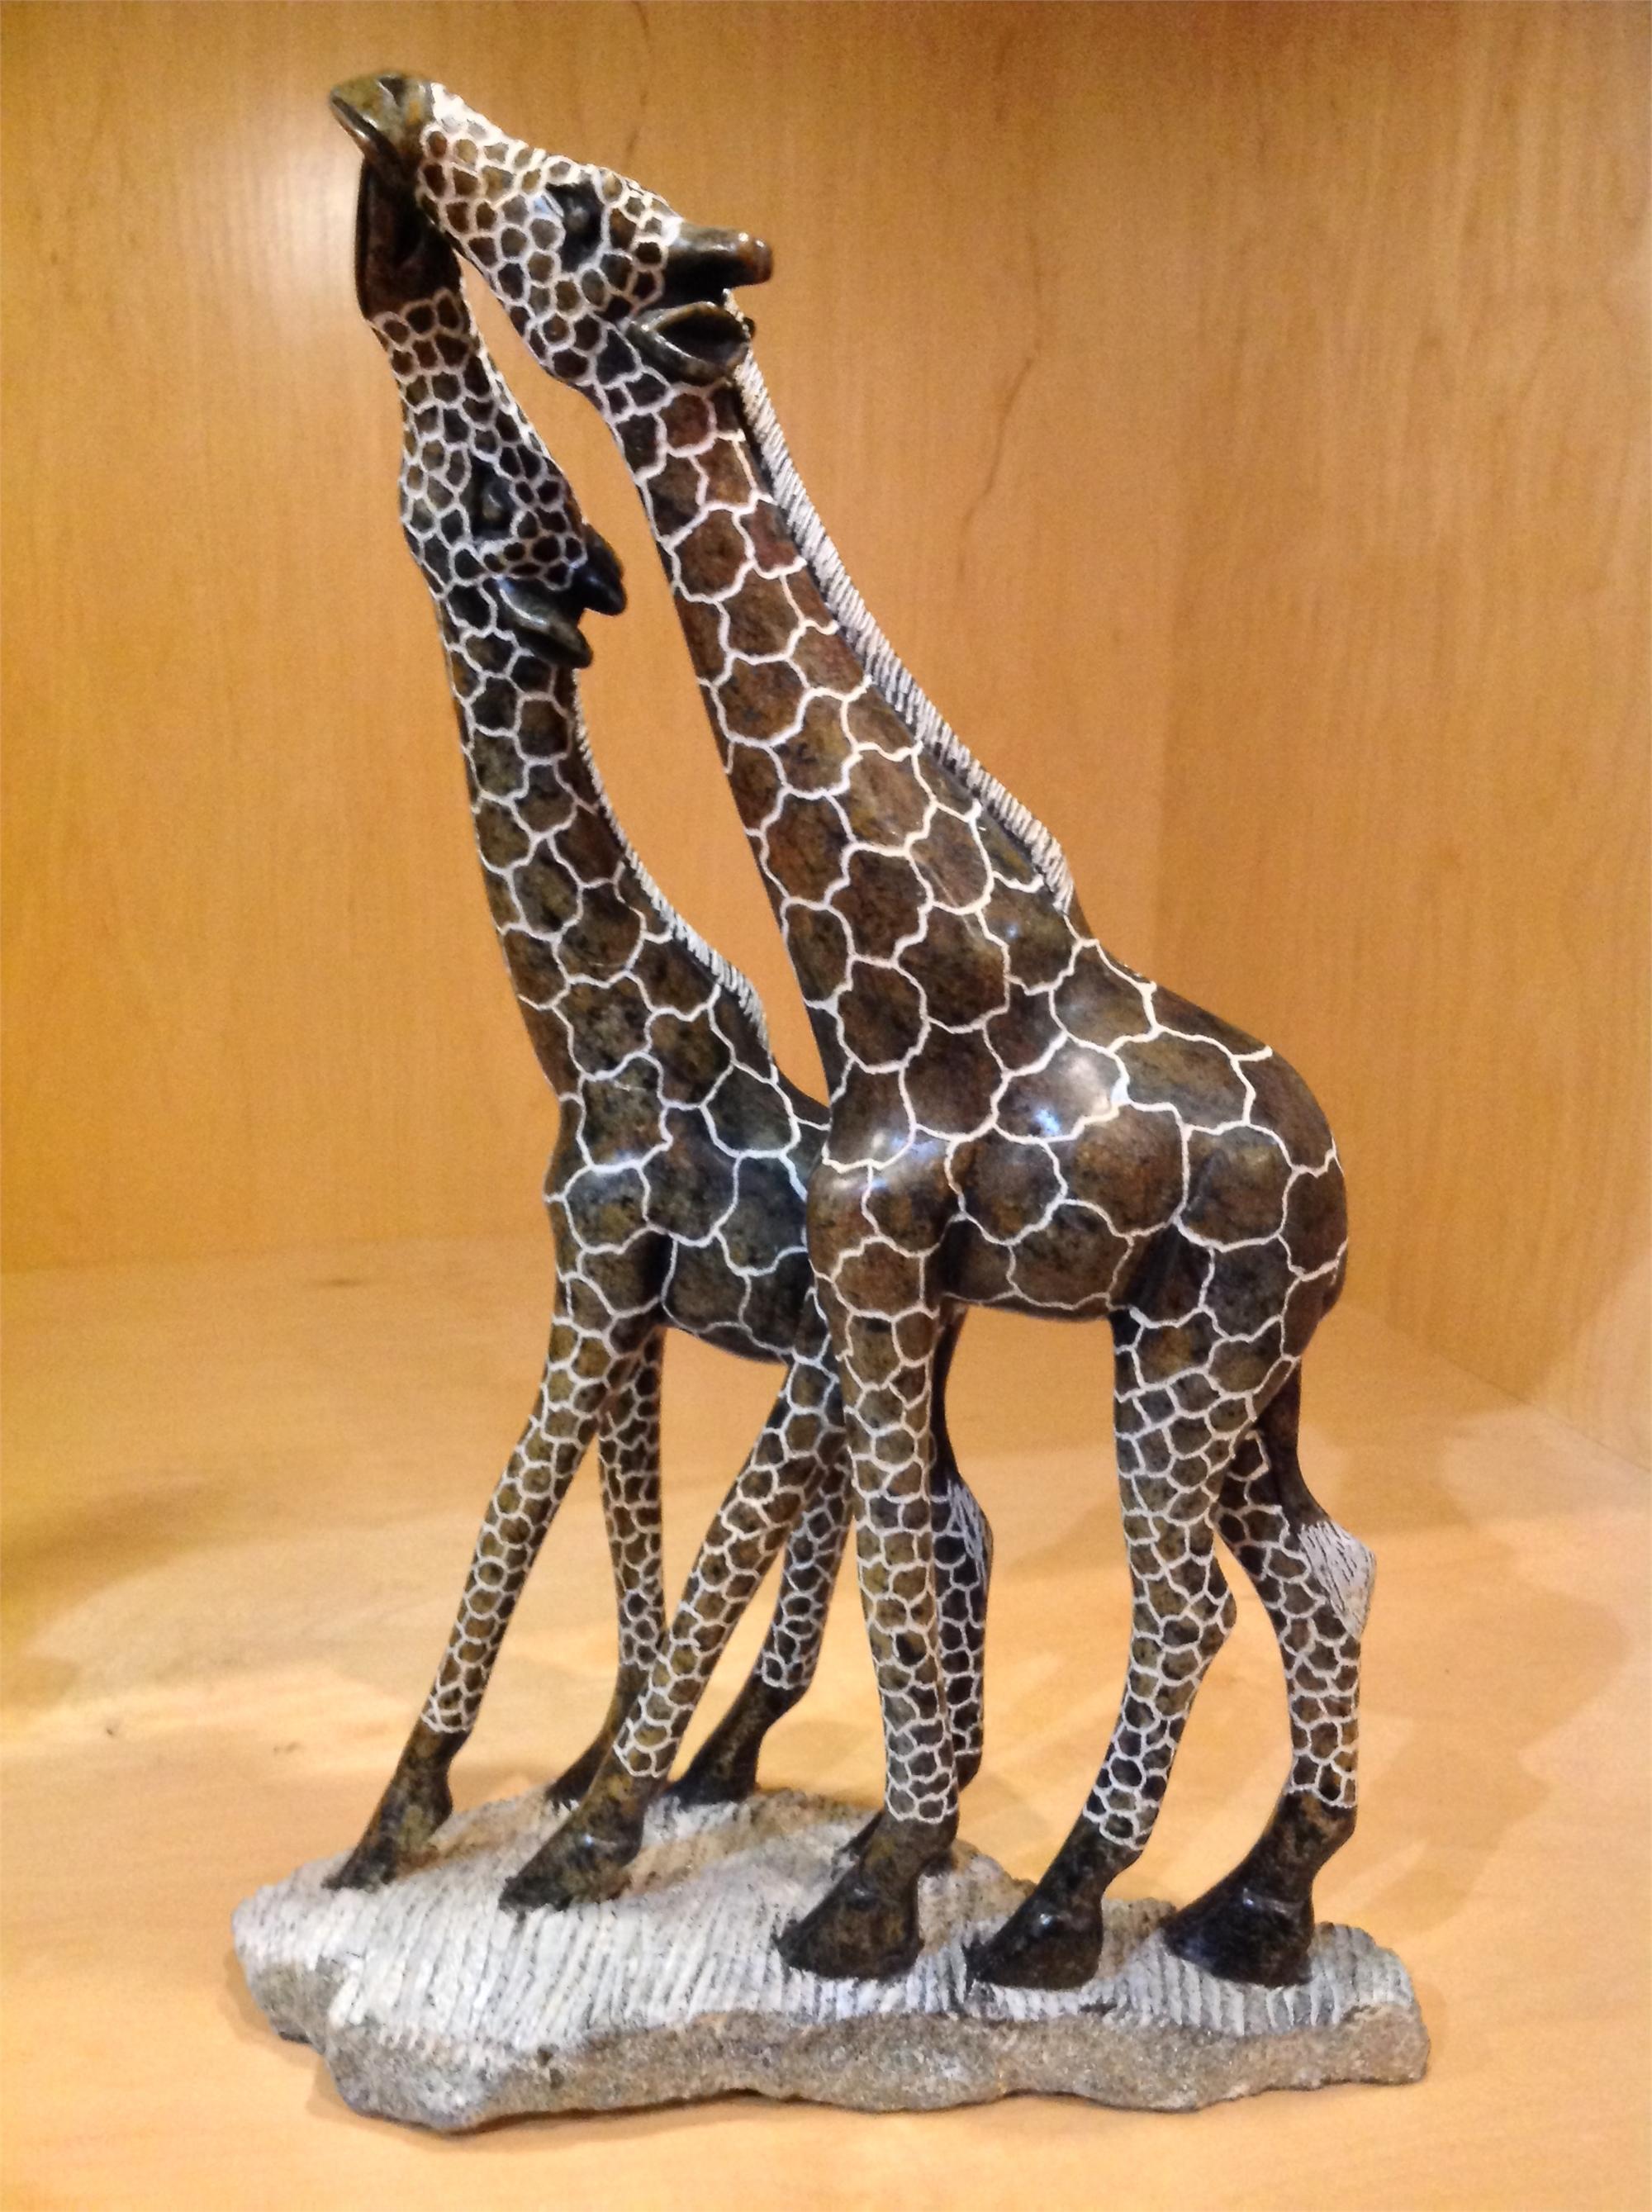 """Kissing Giraffes"" by Stone Of Shona Lloyd Ngwaru"